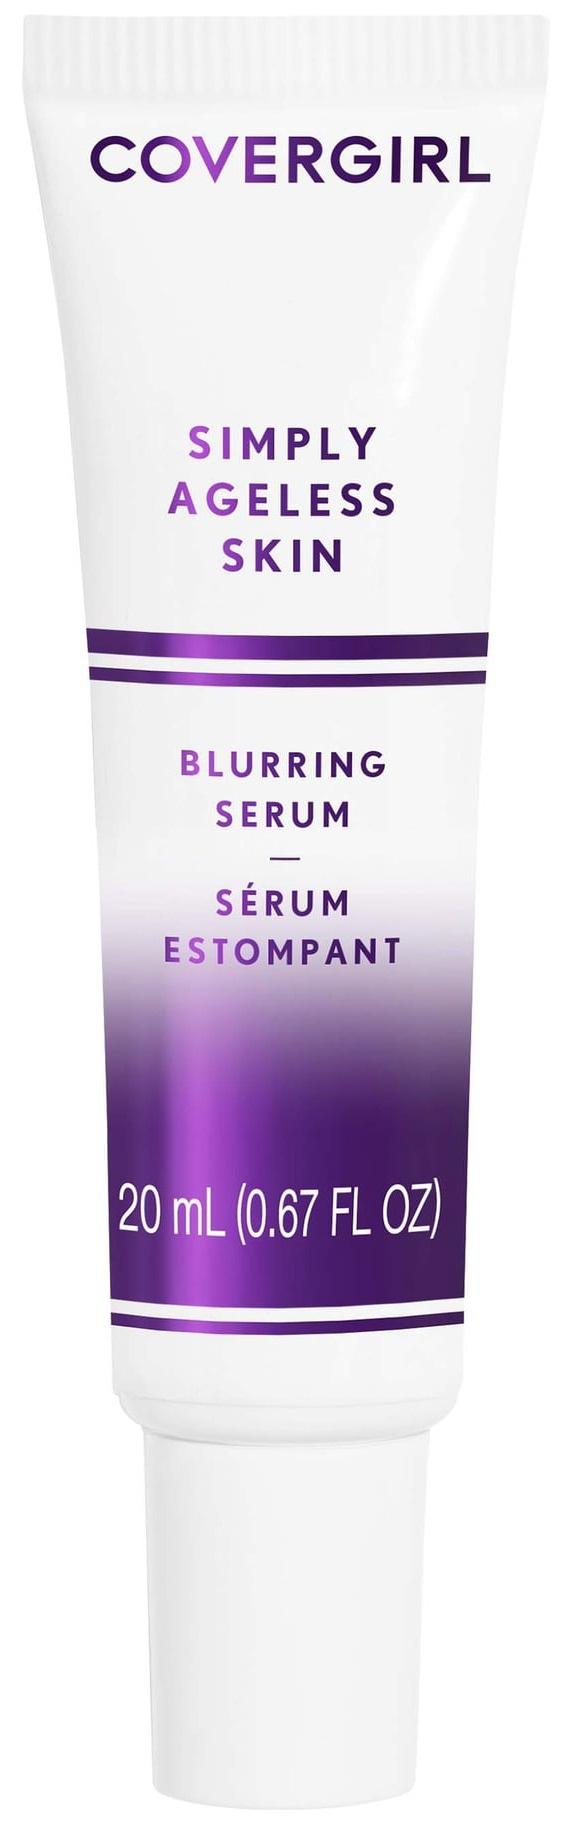 COVERGIRL® Simply Ageless Skin Blurring Serum